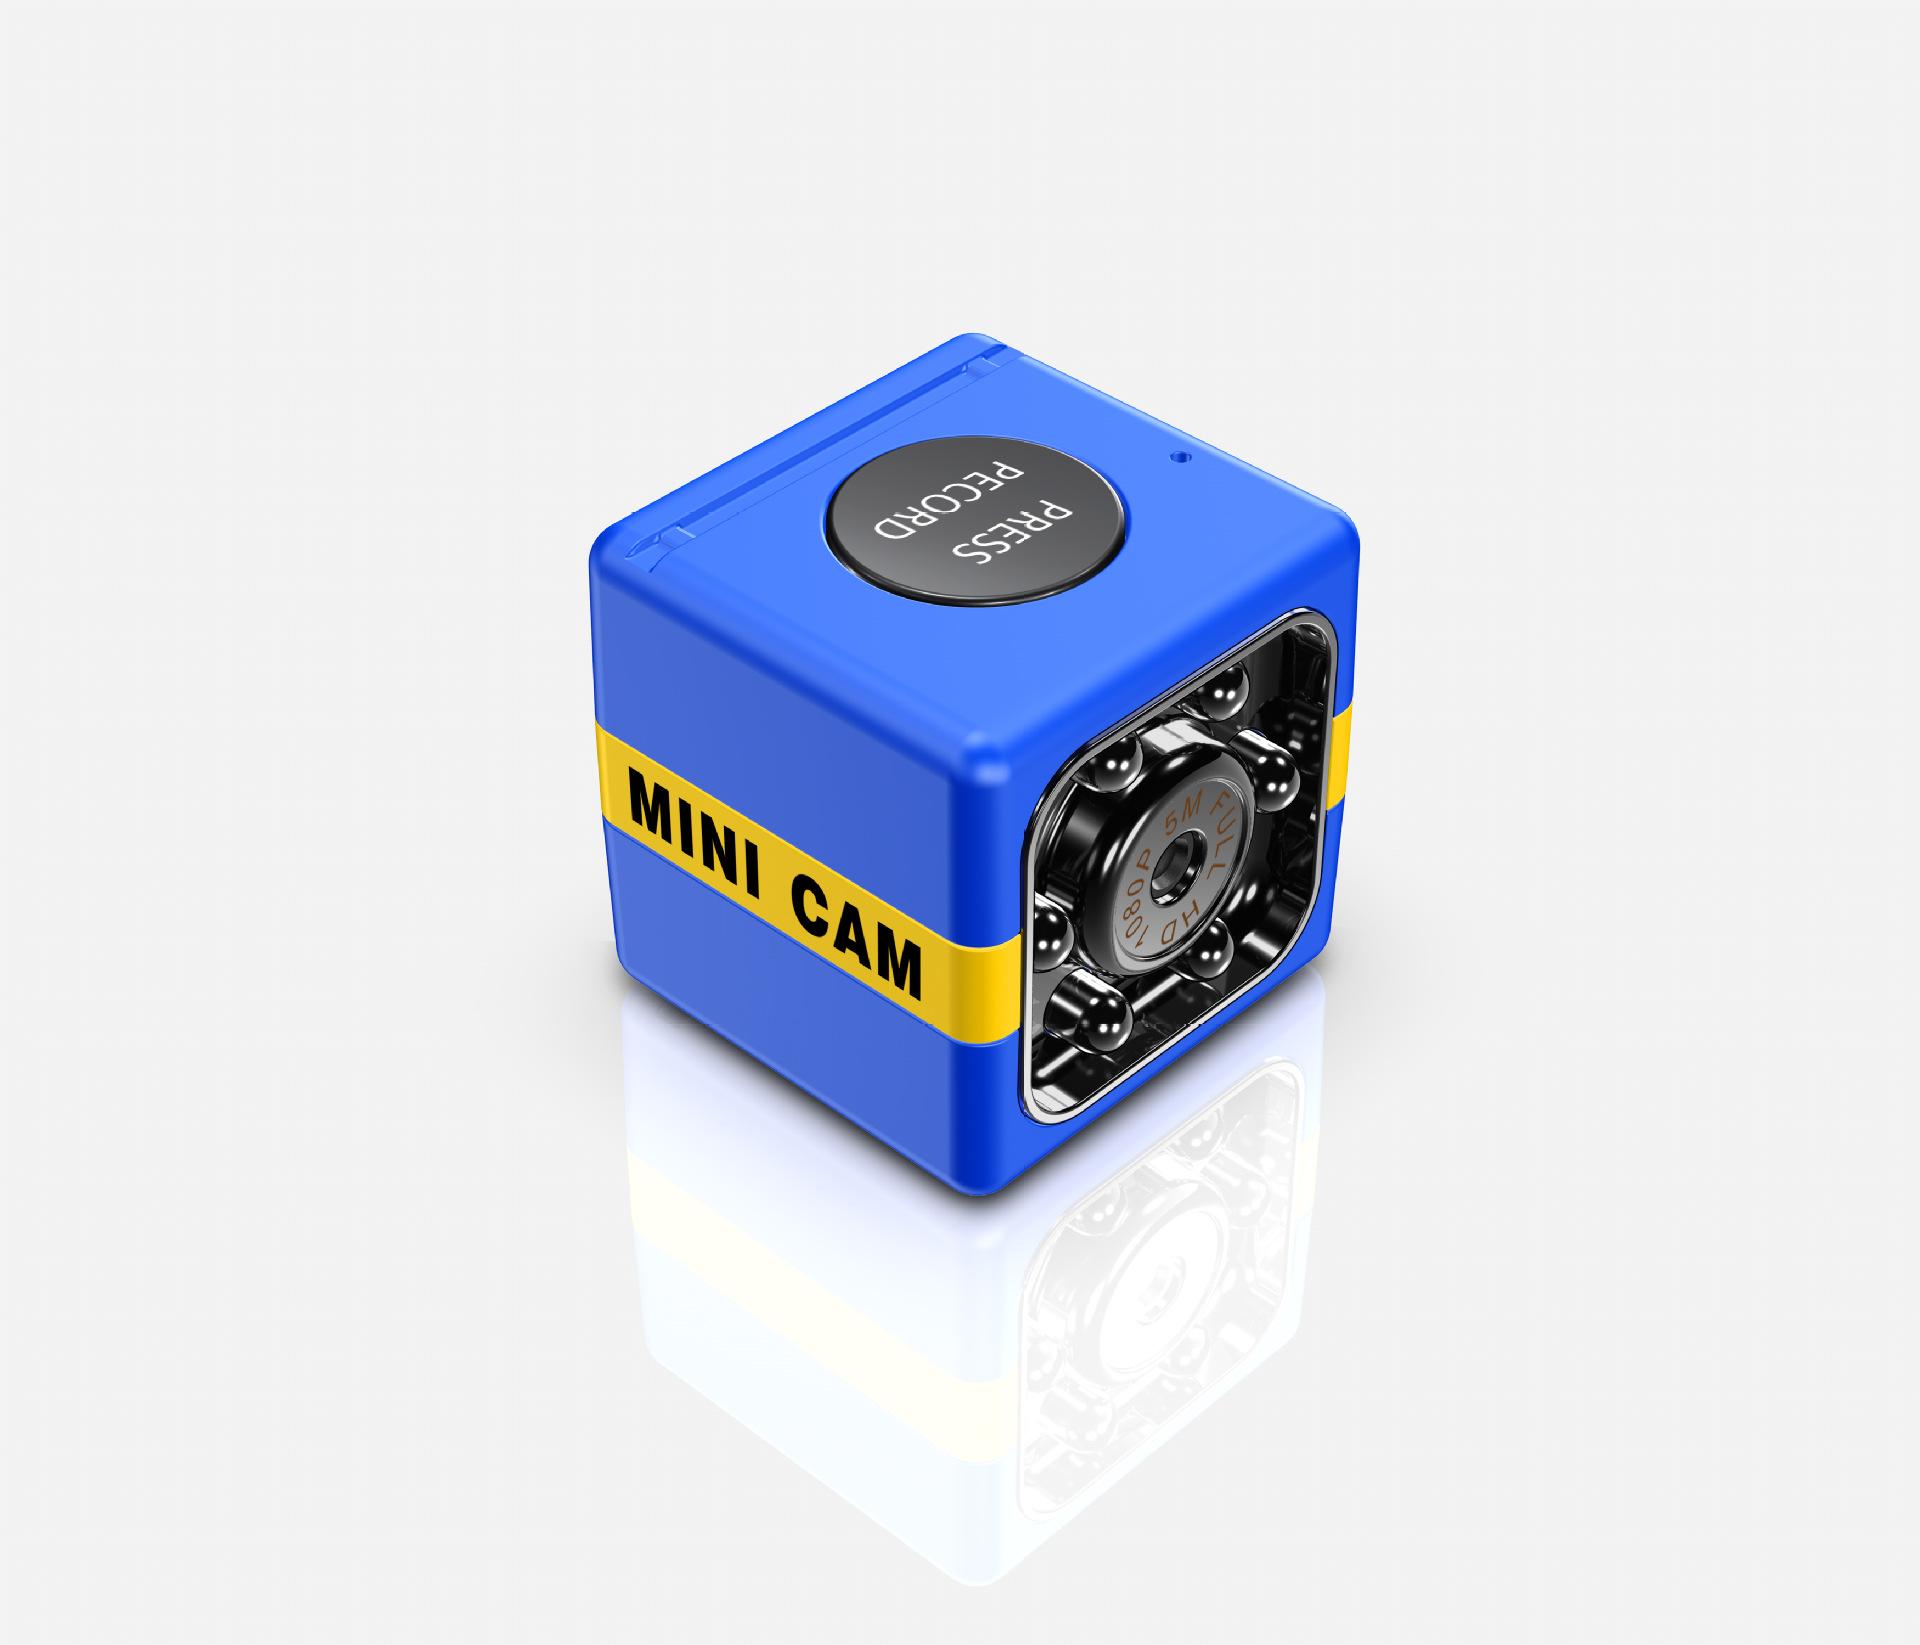 FX01 Mini IP Camera Wireless WiFi HD 1080P Hidden Home Security Night Vision Monitor blue